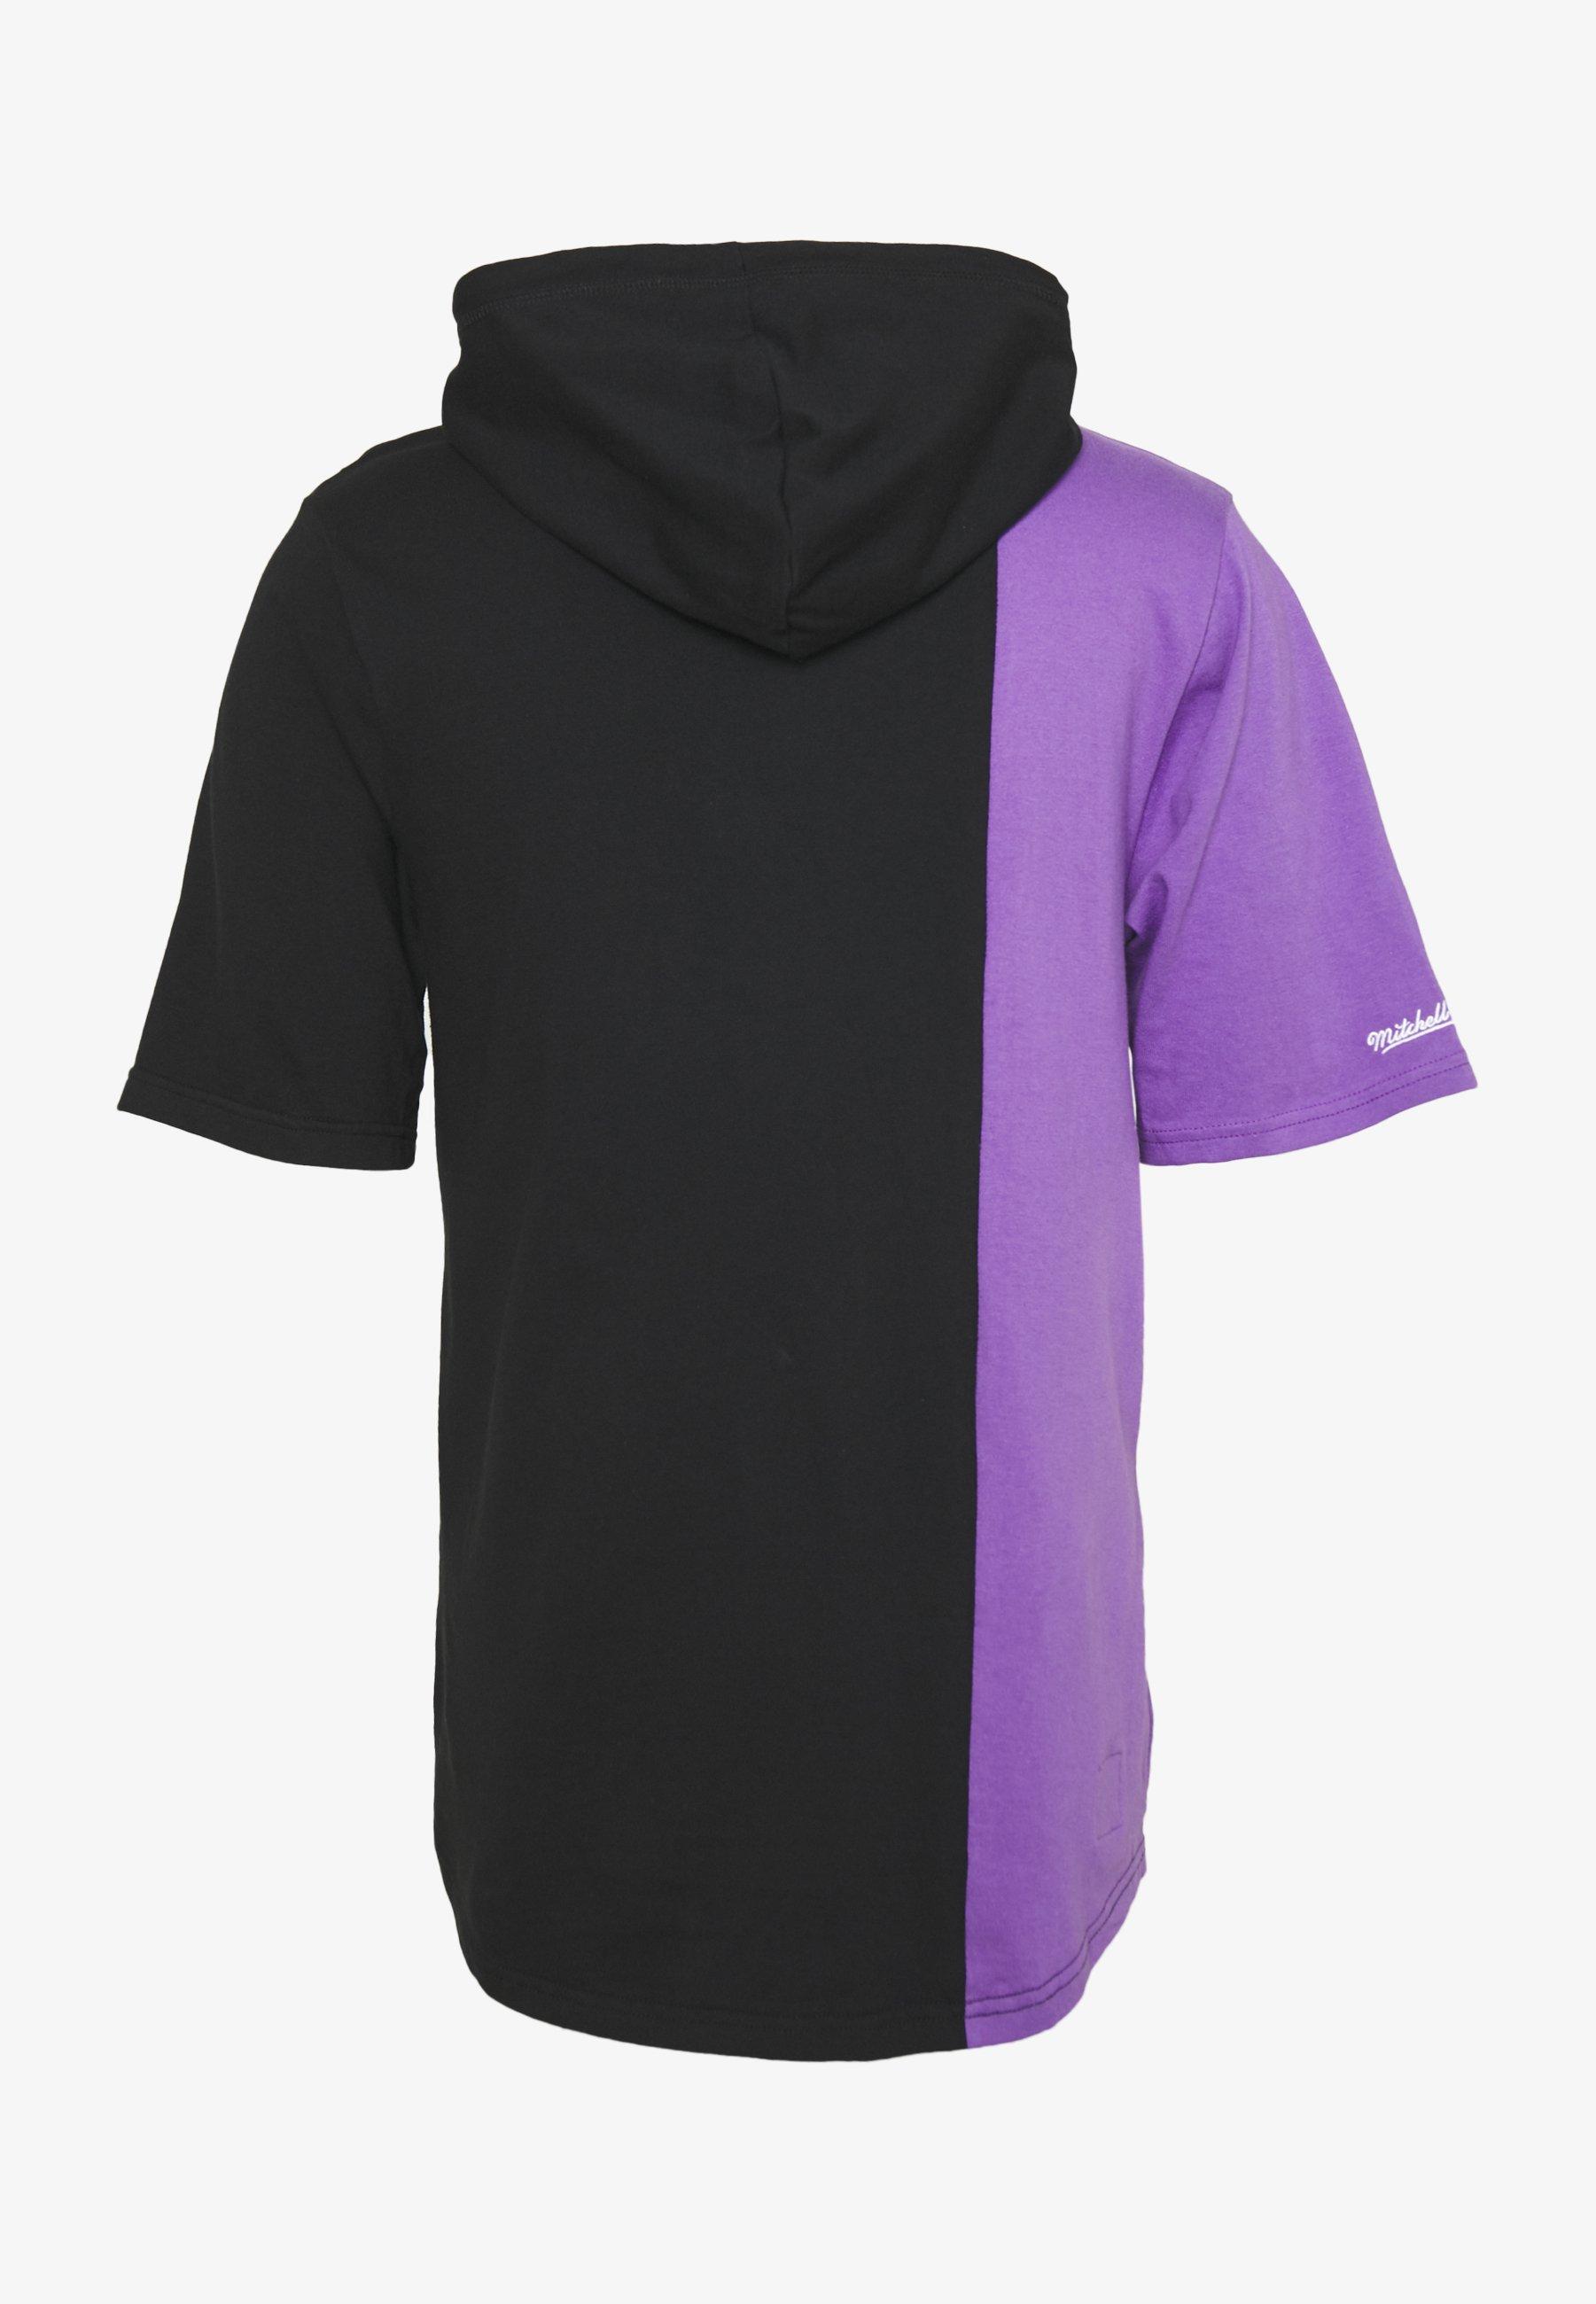 Mitchell & Ness Nba Toronto Raptors Shortsleeve Split Hoody - Klubbkläder Black/purple